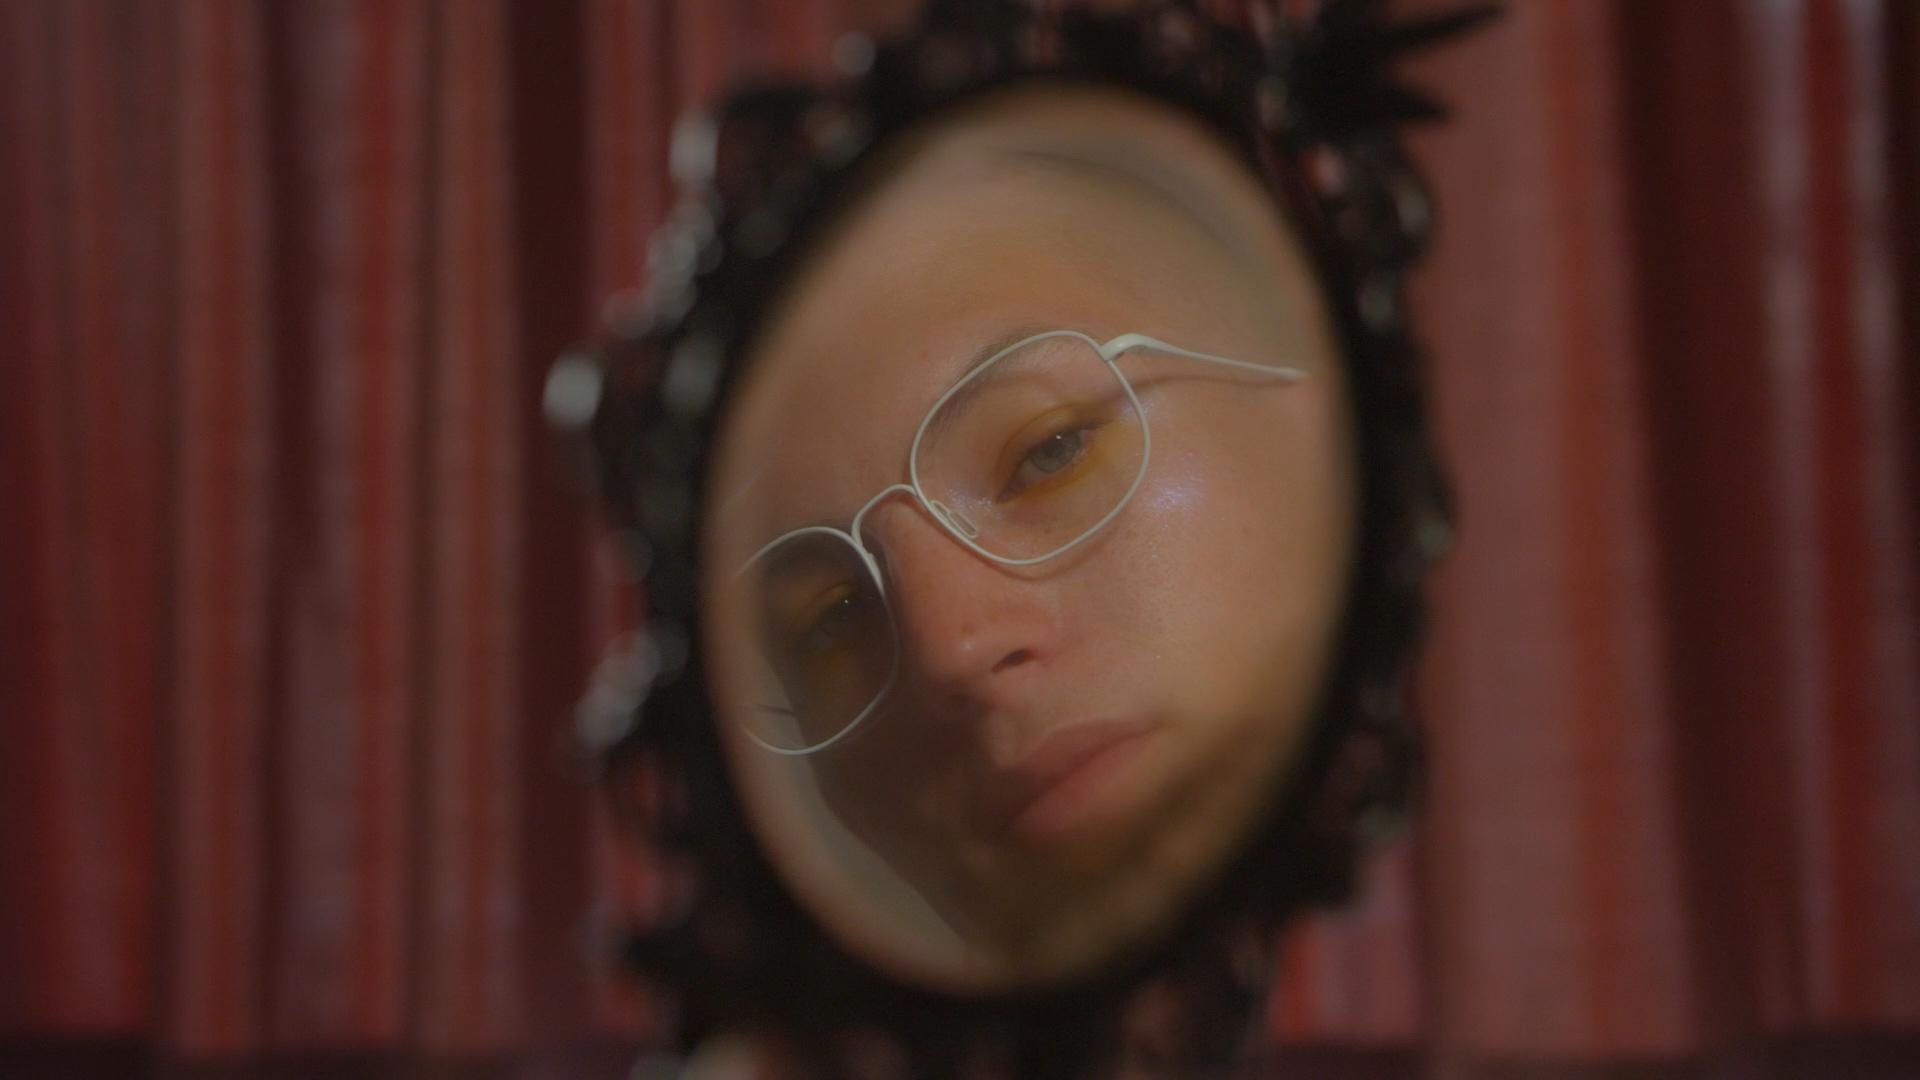 Gus Dapperton x Dazed